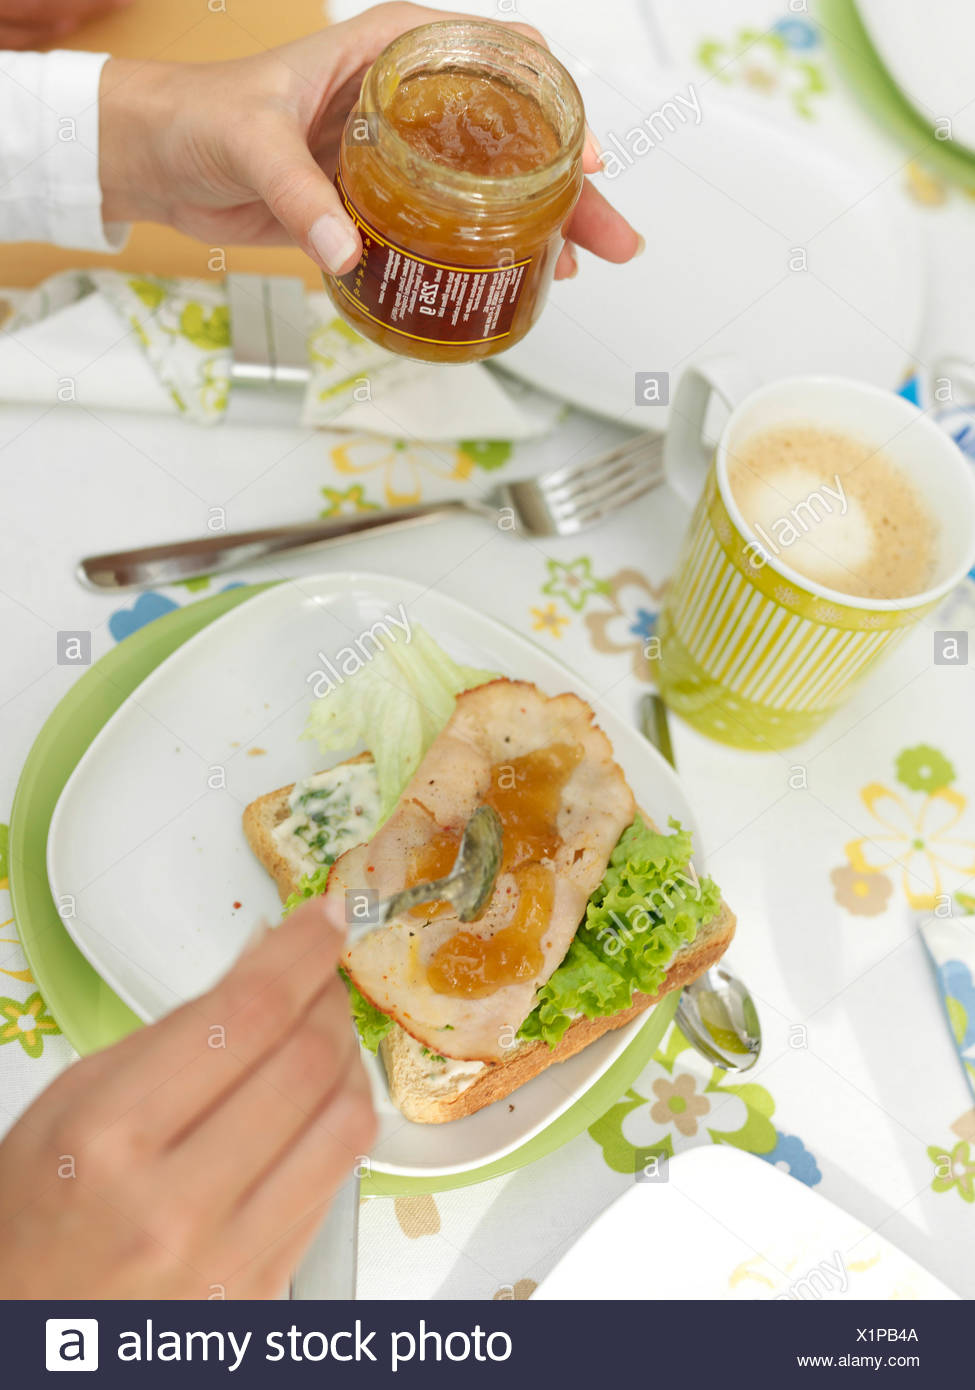 Person's hands spreading jam on prosciutto - Stock Image